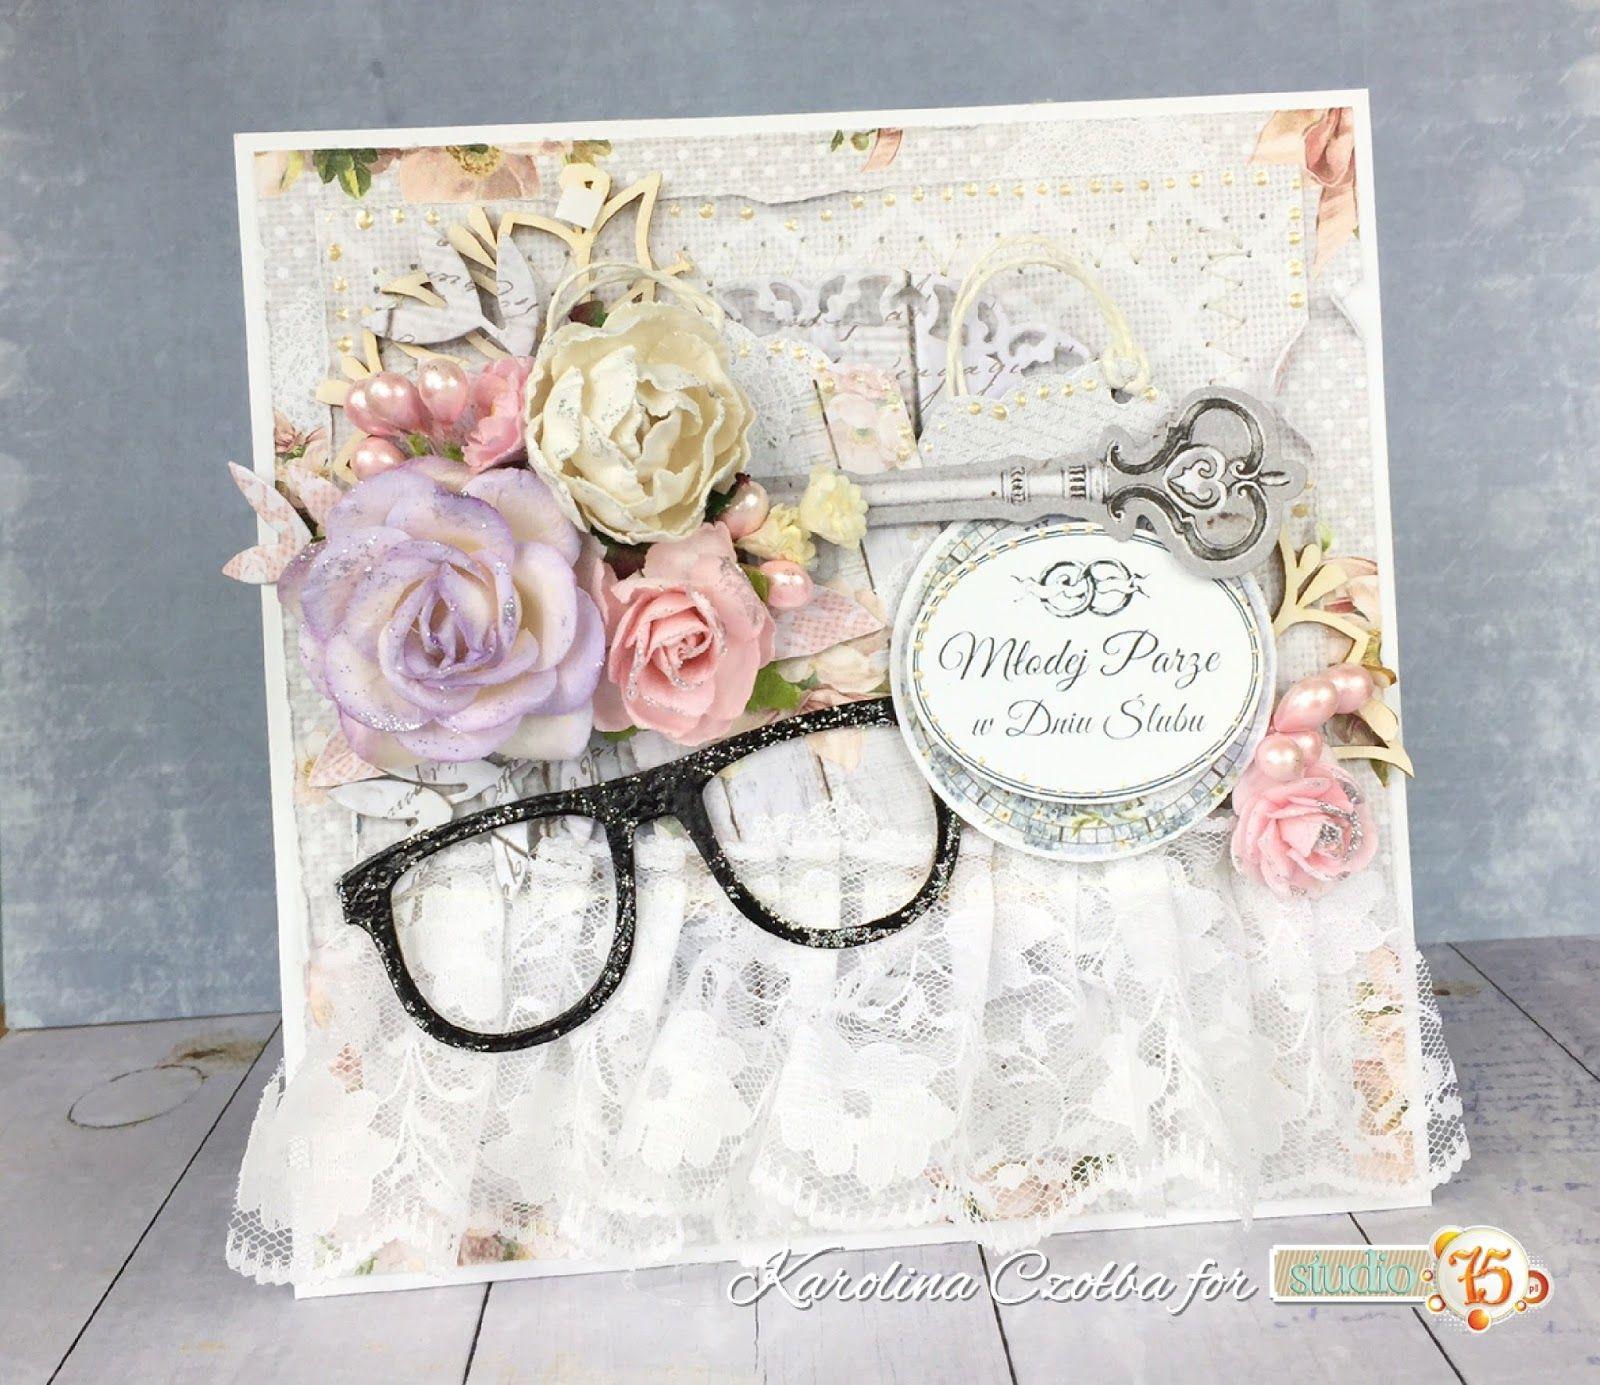 How to scrapbook wedding cards - Wedding Card From Studio 75 Papers Cardmaking Scrapbooking